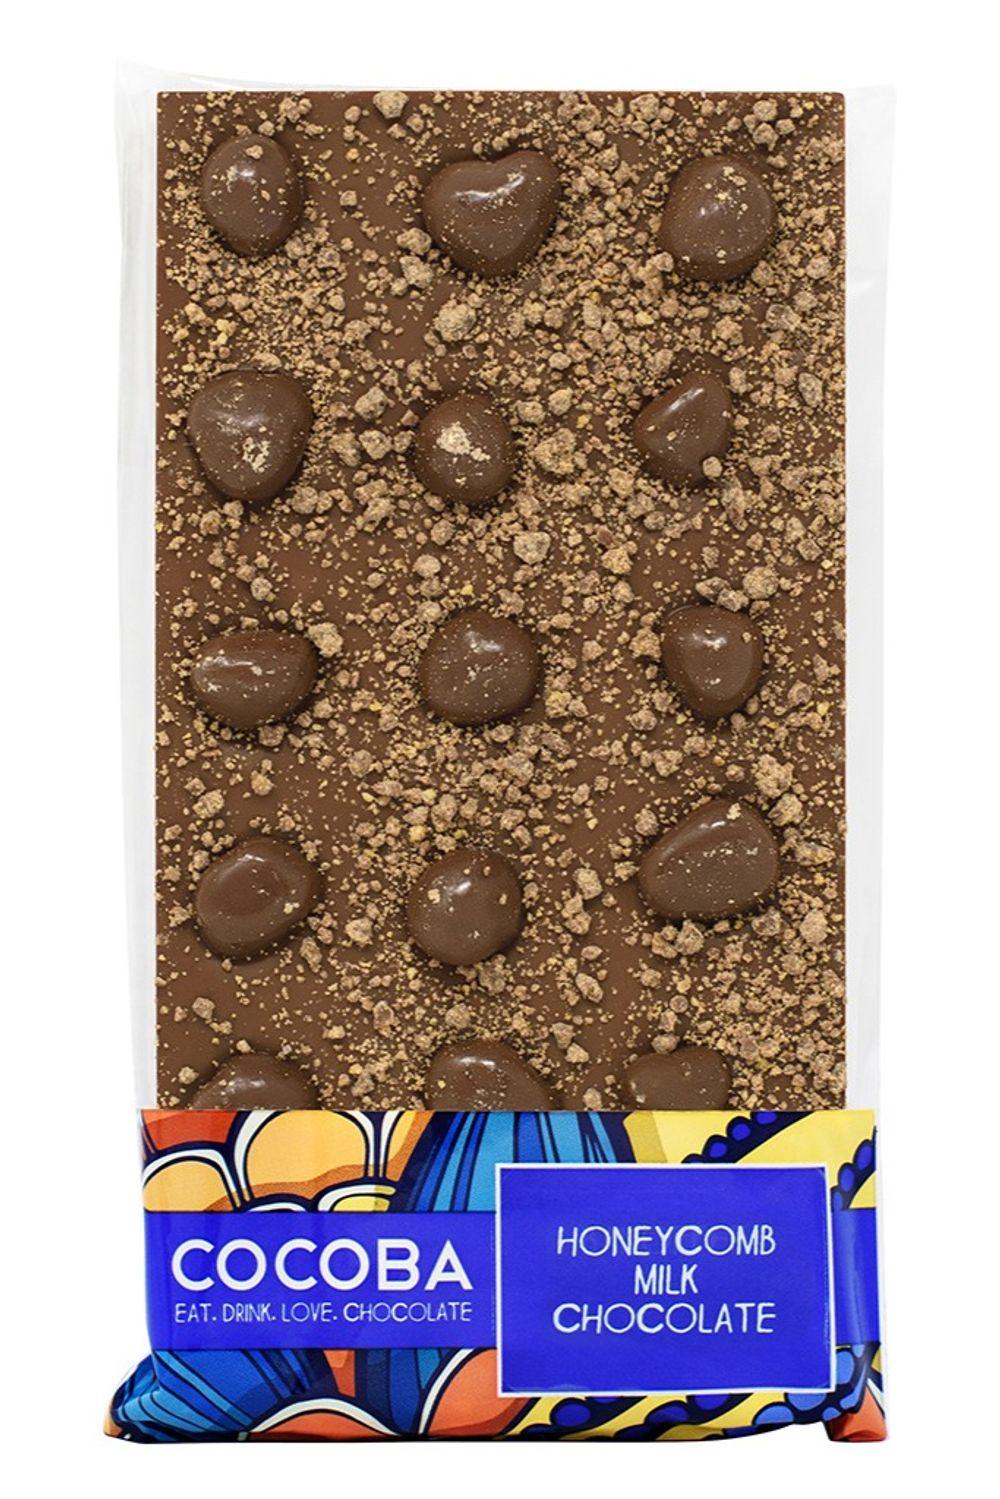 Honeycomb Milk Chocolate Bar